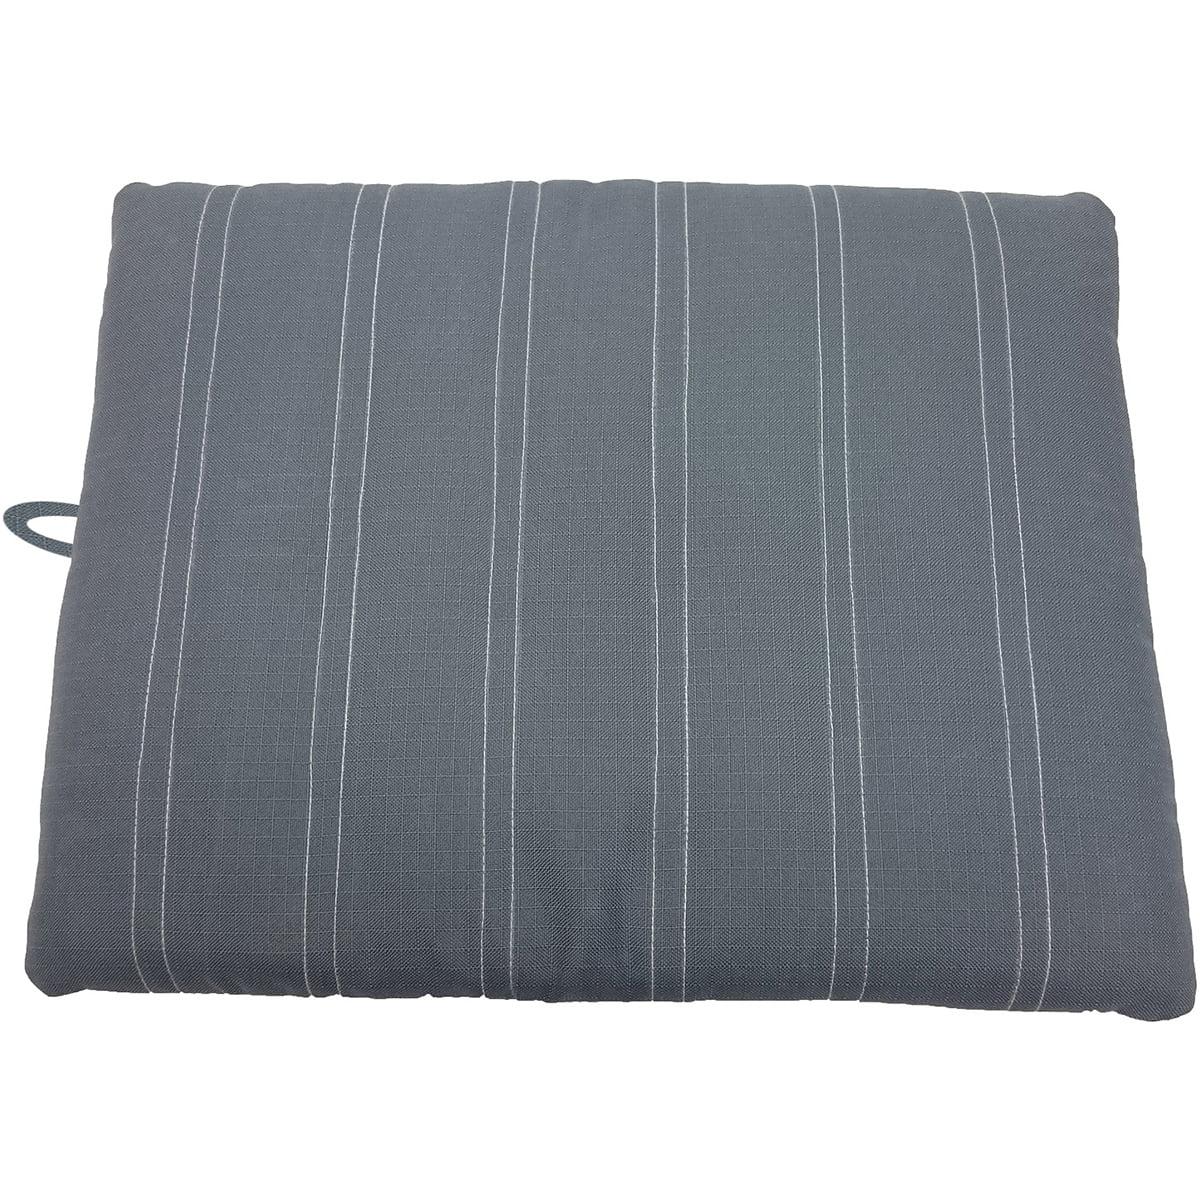 "Sleep Zone 18"" Durable Pet Bed-Gray - image 1 of 1"